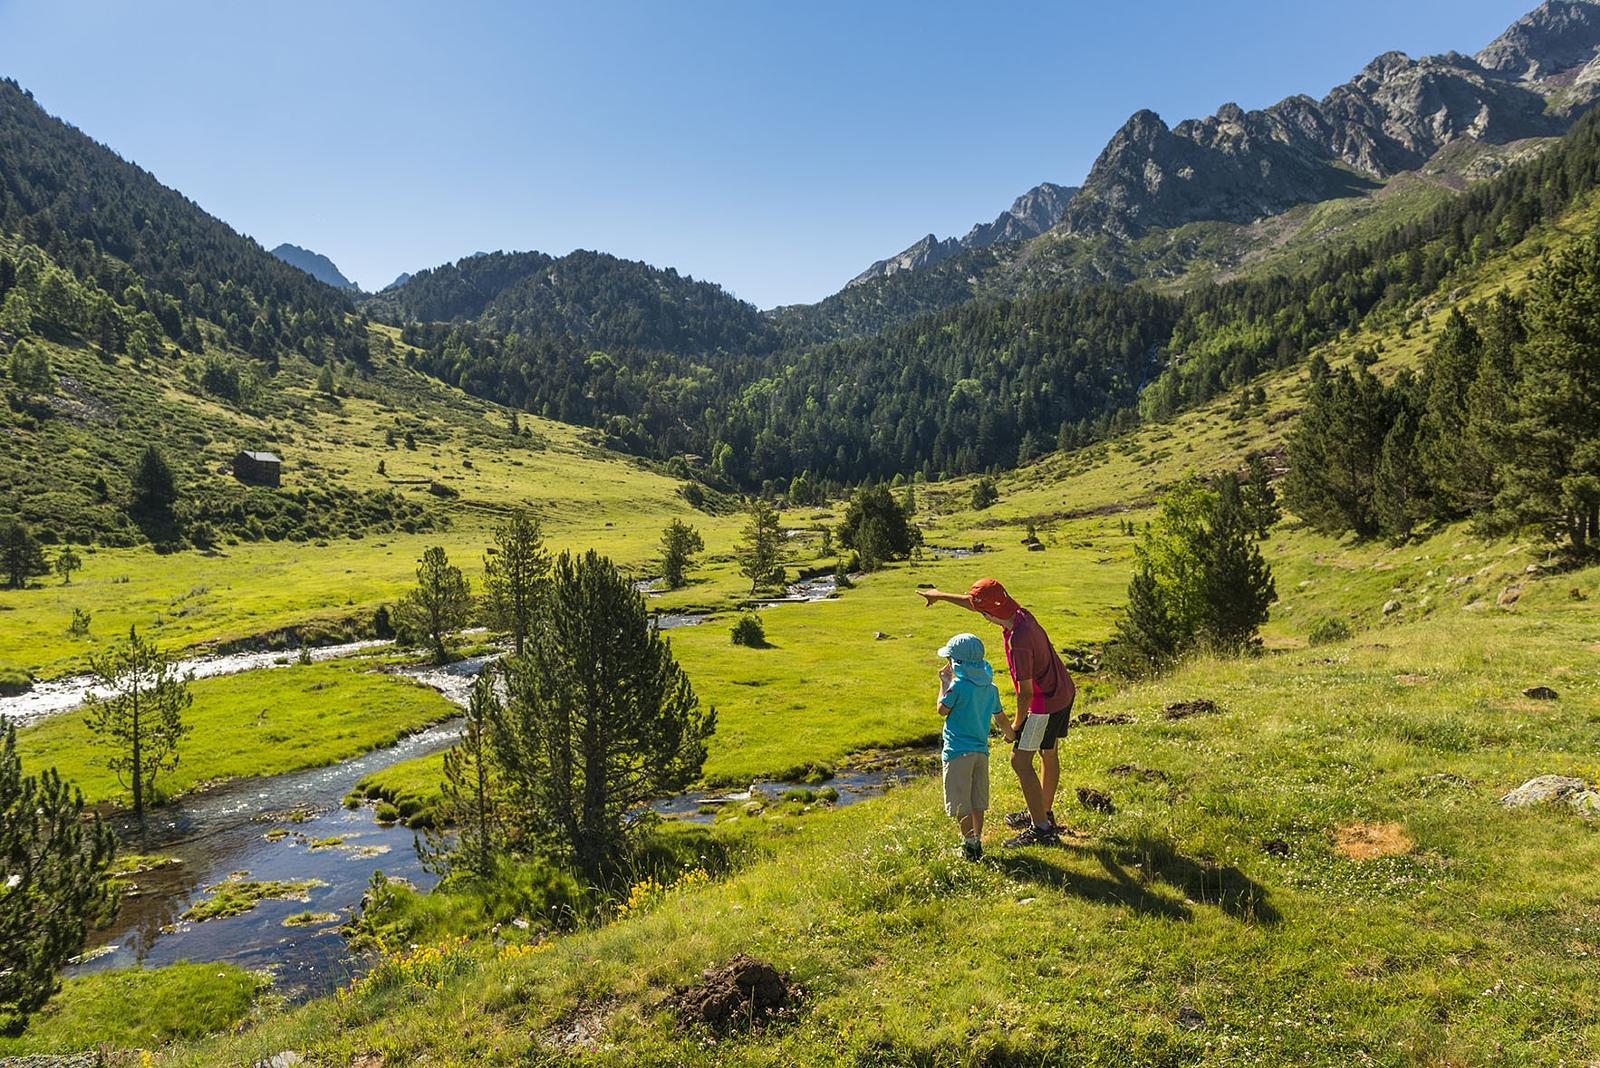 Pla de Boet, Pallars Sobirà